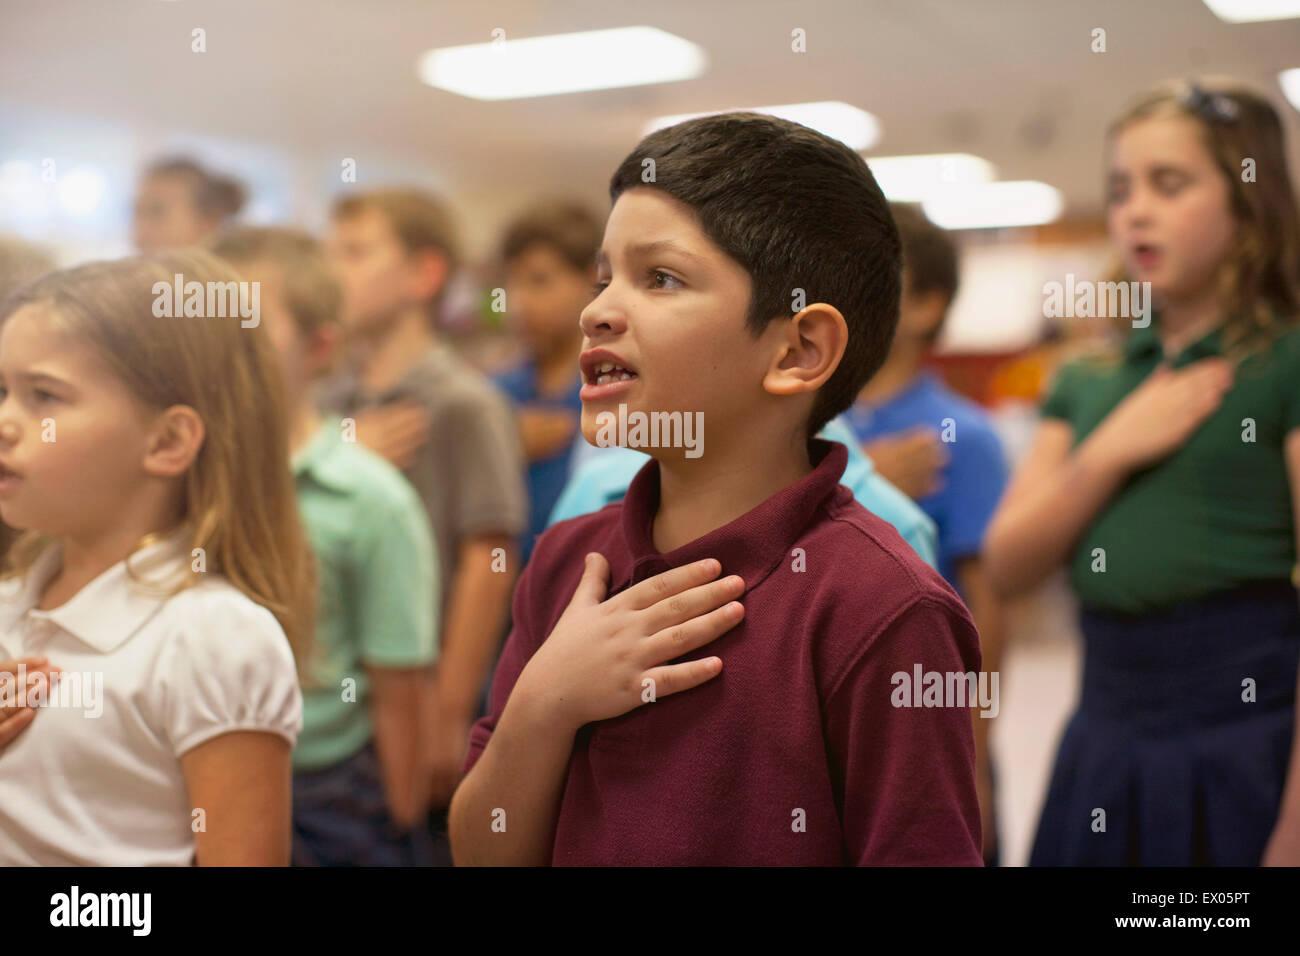 Children reciting Pledge of Allegiance in school - Stock Image